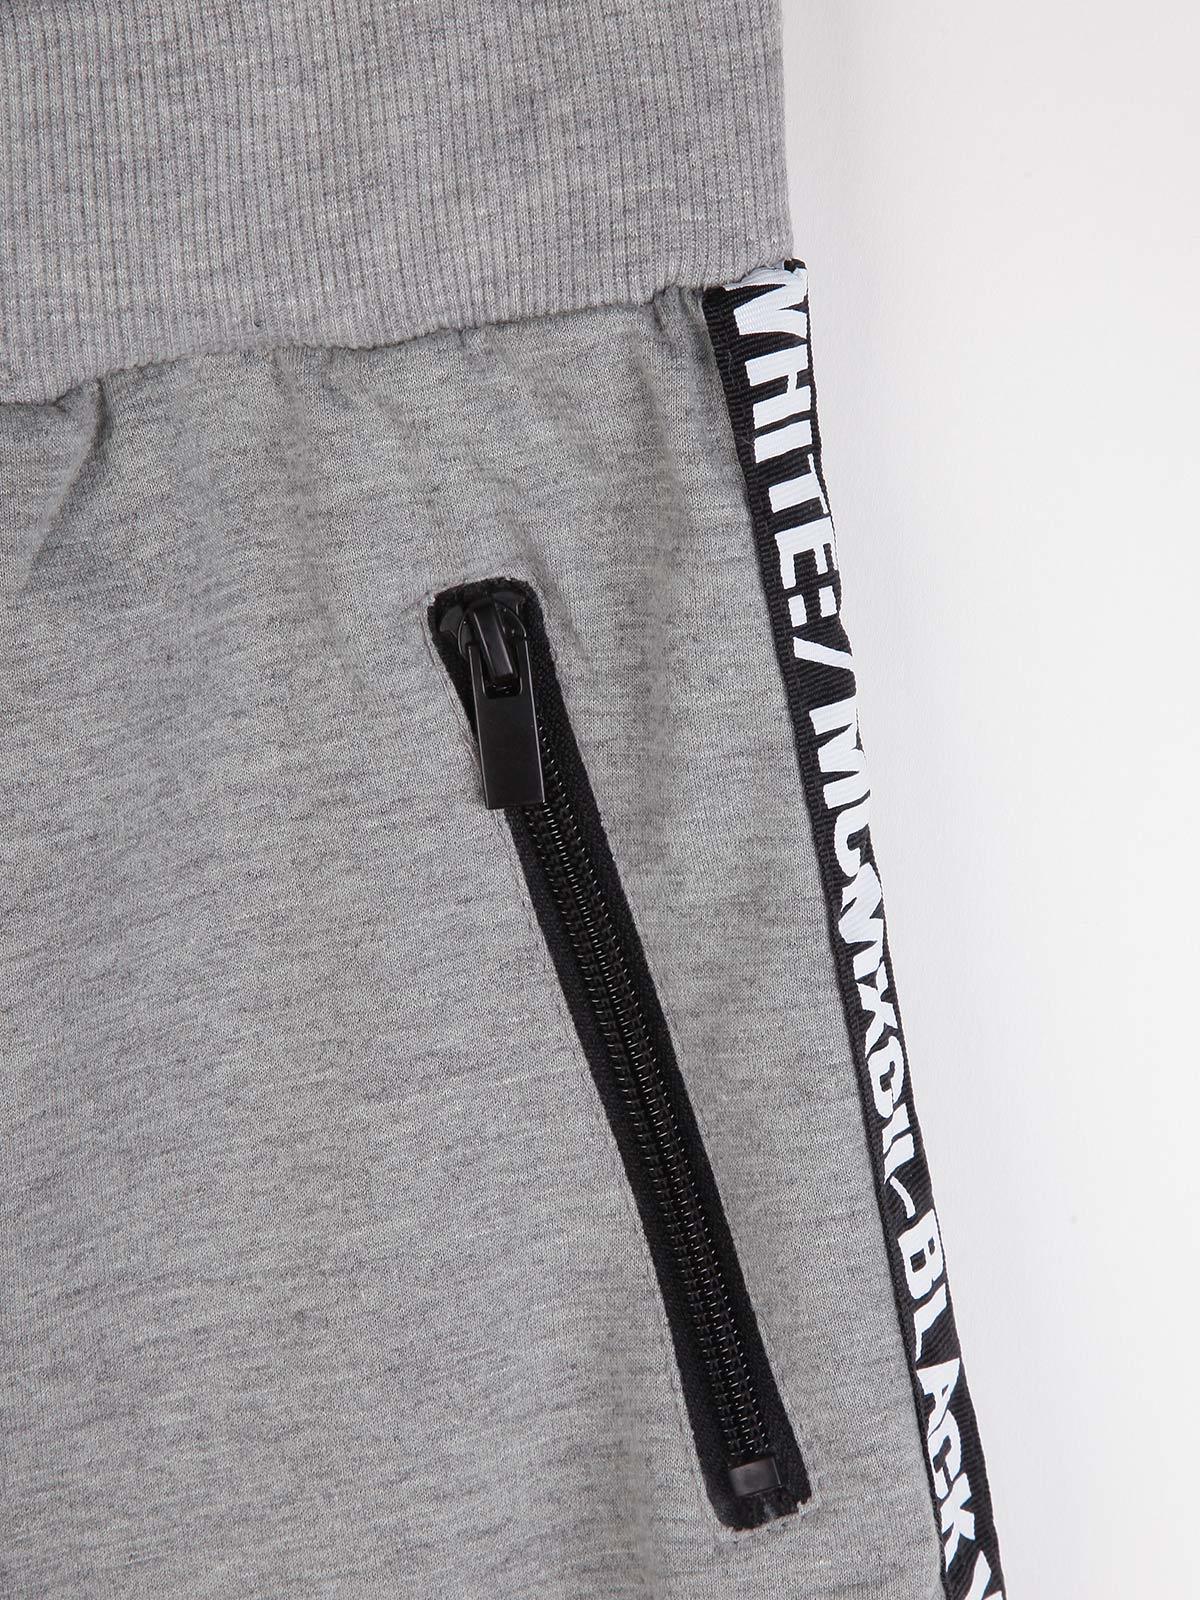 Pantalones Deportivos Para Ninos Chico Mecshopping